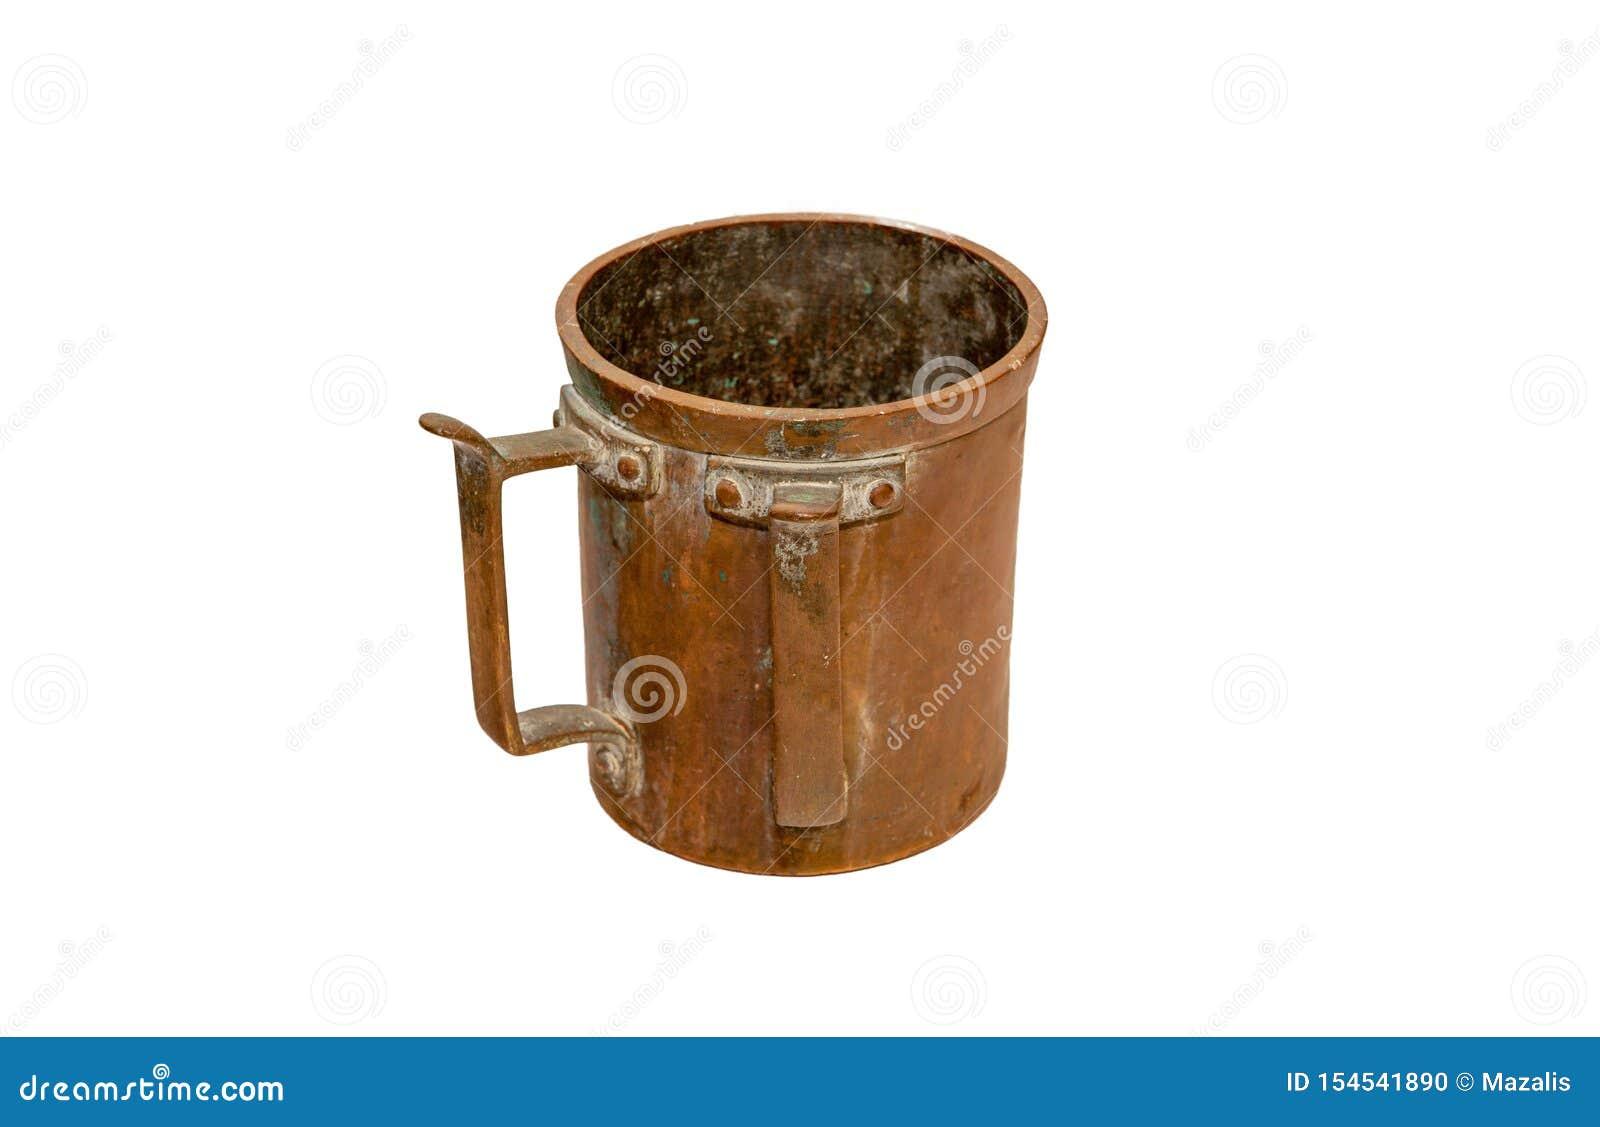 Old Jewish mug with two handlest isolated on white background